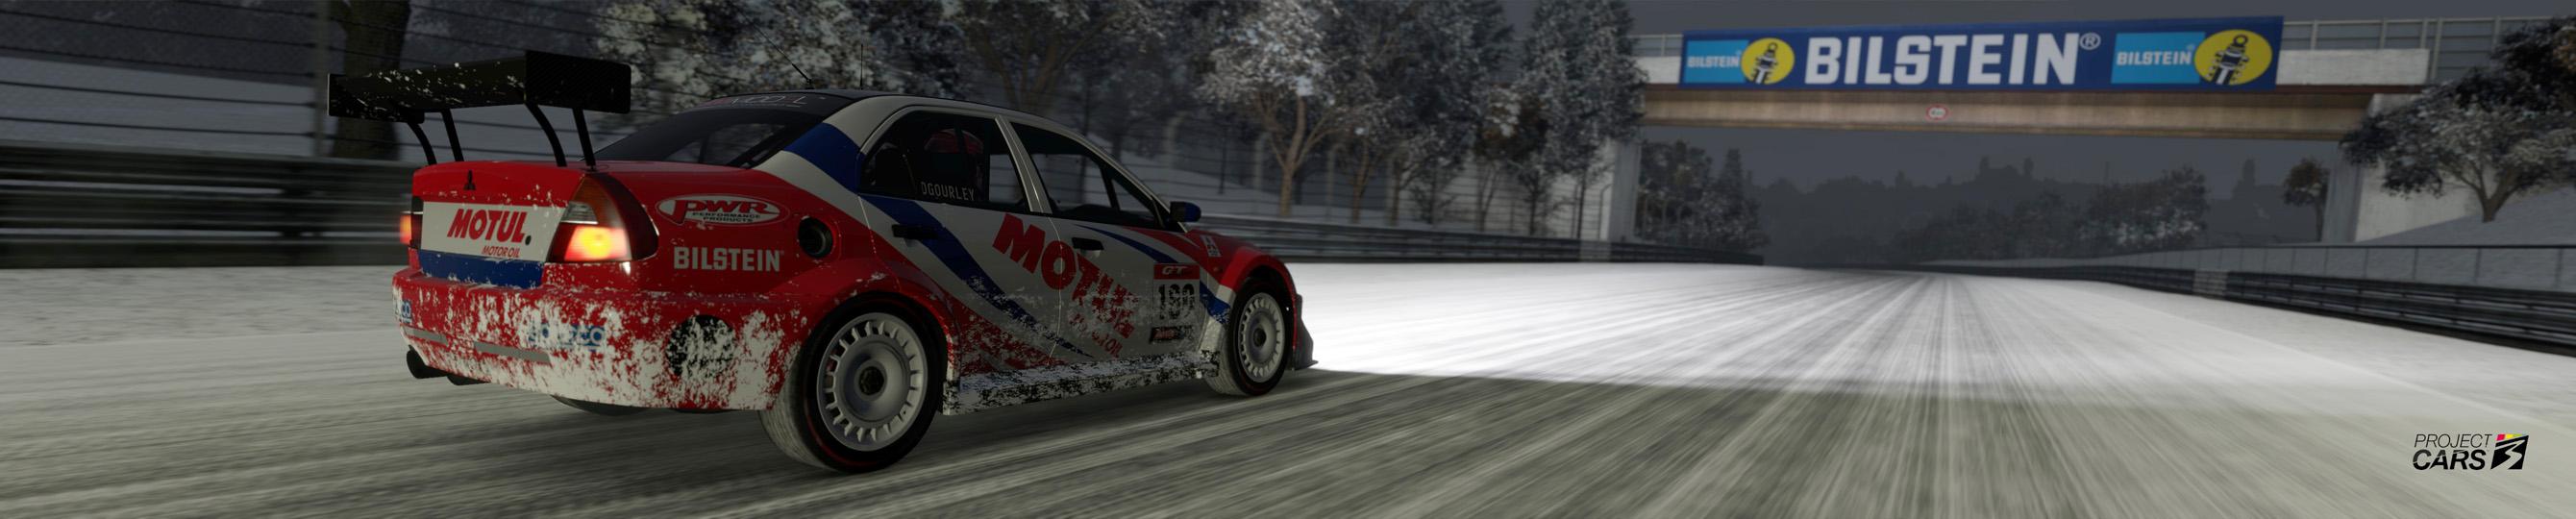 1 PROJECT CARS 3 LANCER EVO VI RACING at NORDS Snow crop copy.jpg